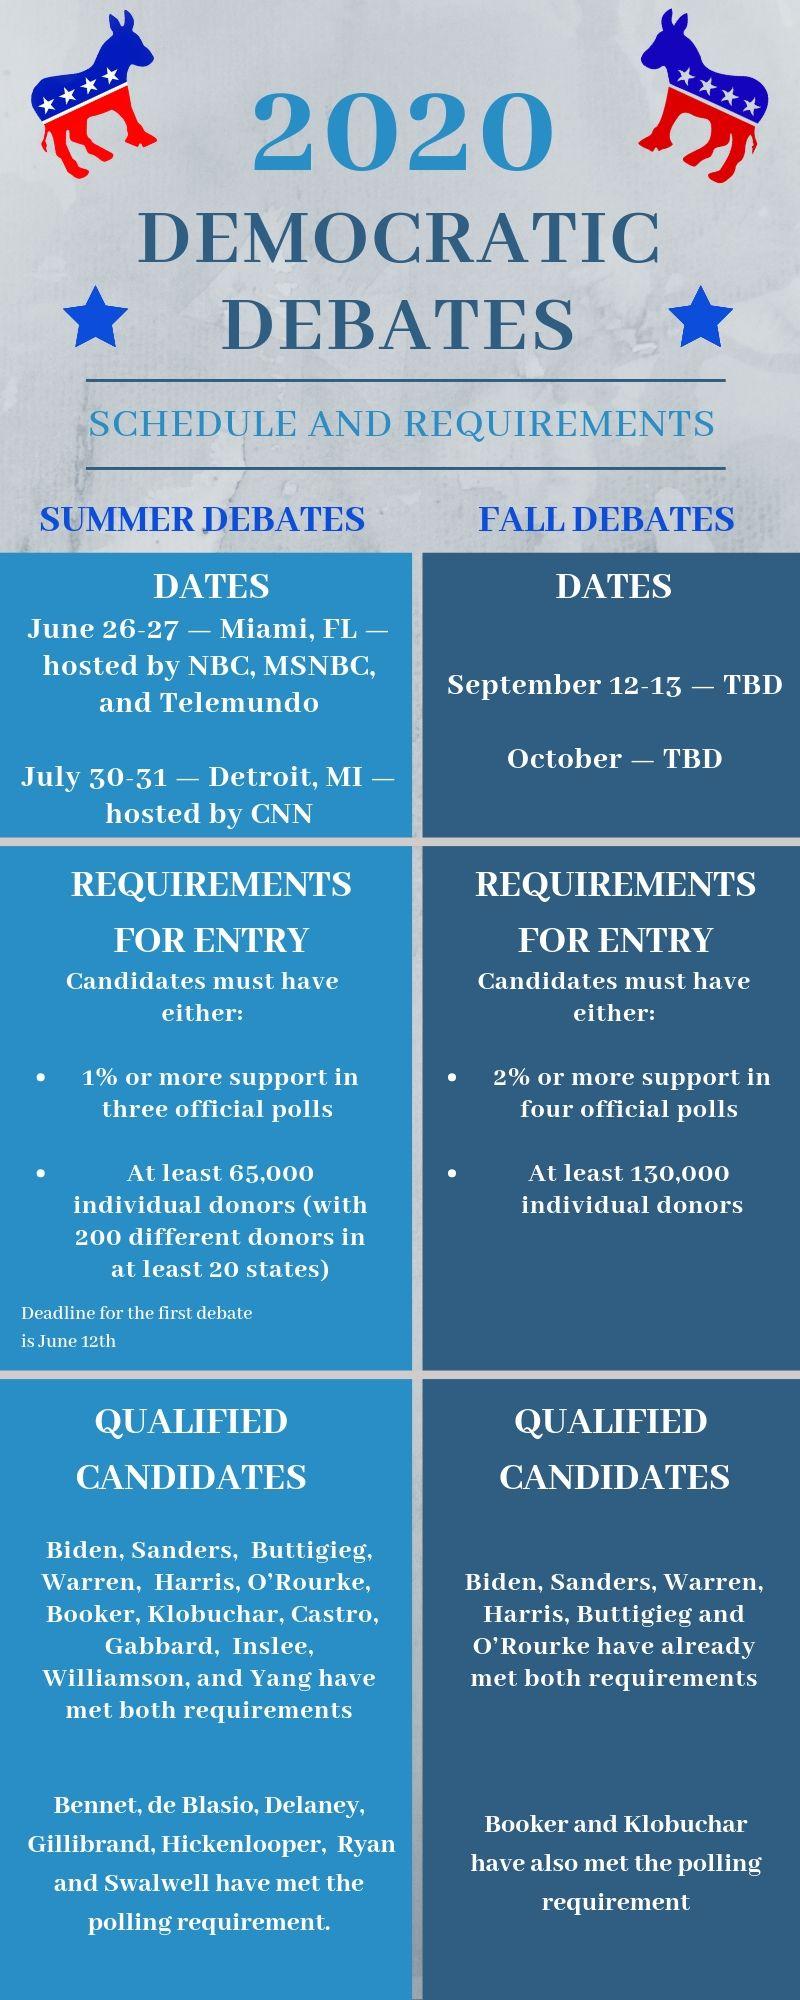 2020 Democratic Debates Infographic.jpg